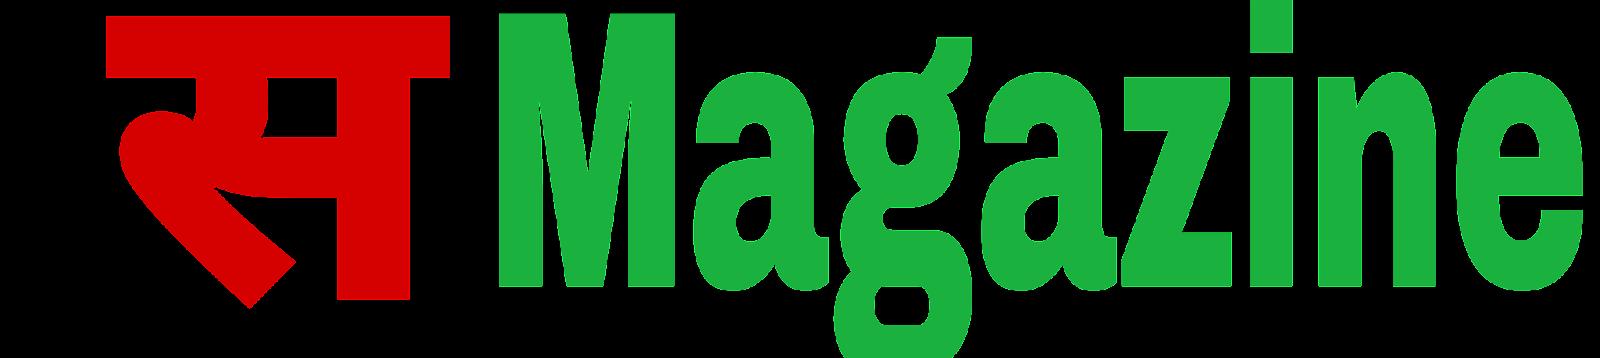 Santali Megazine